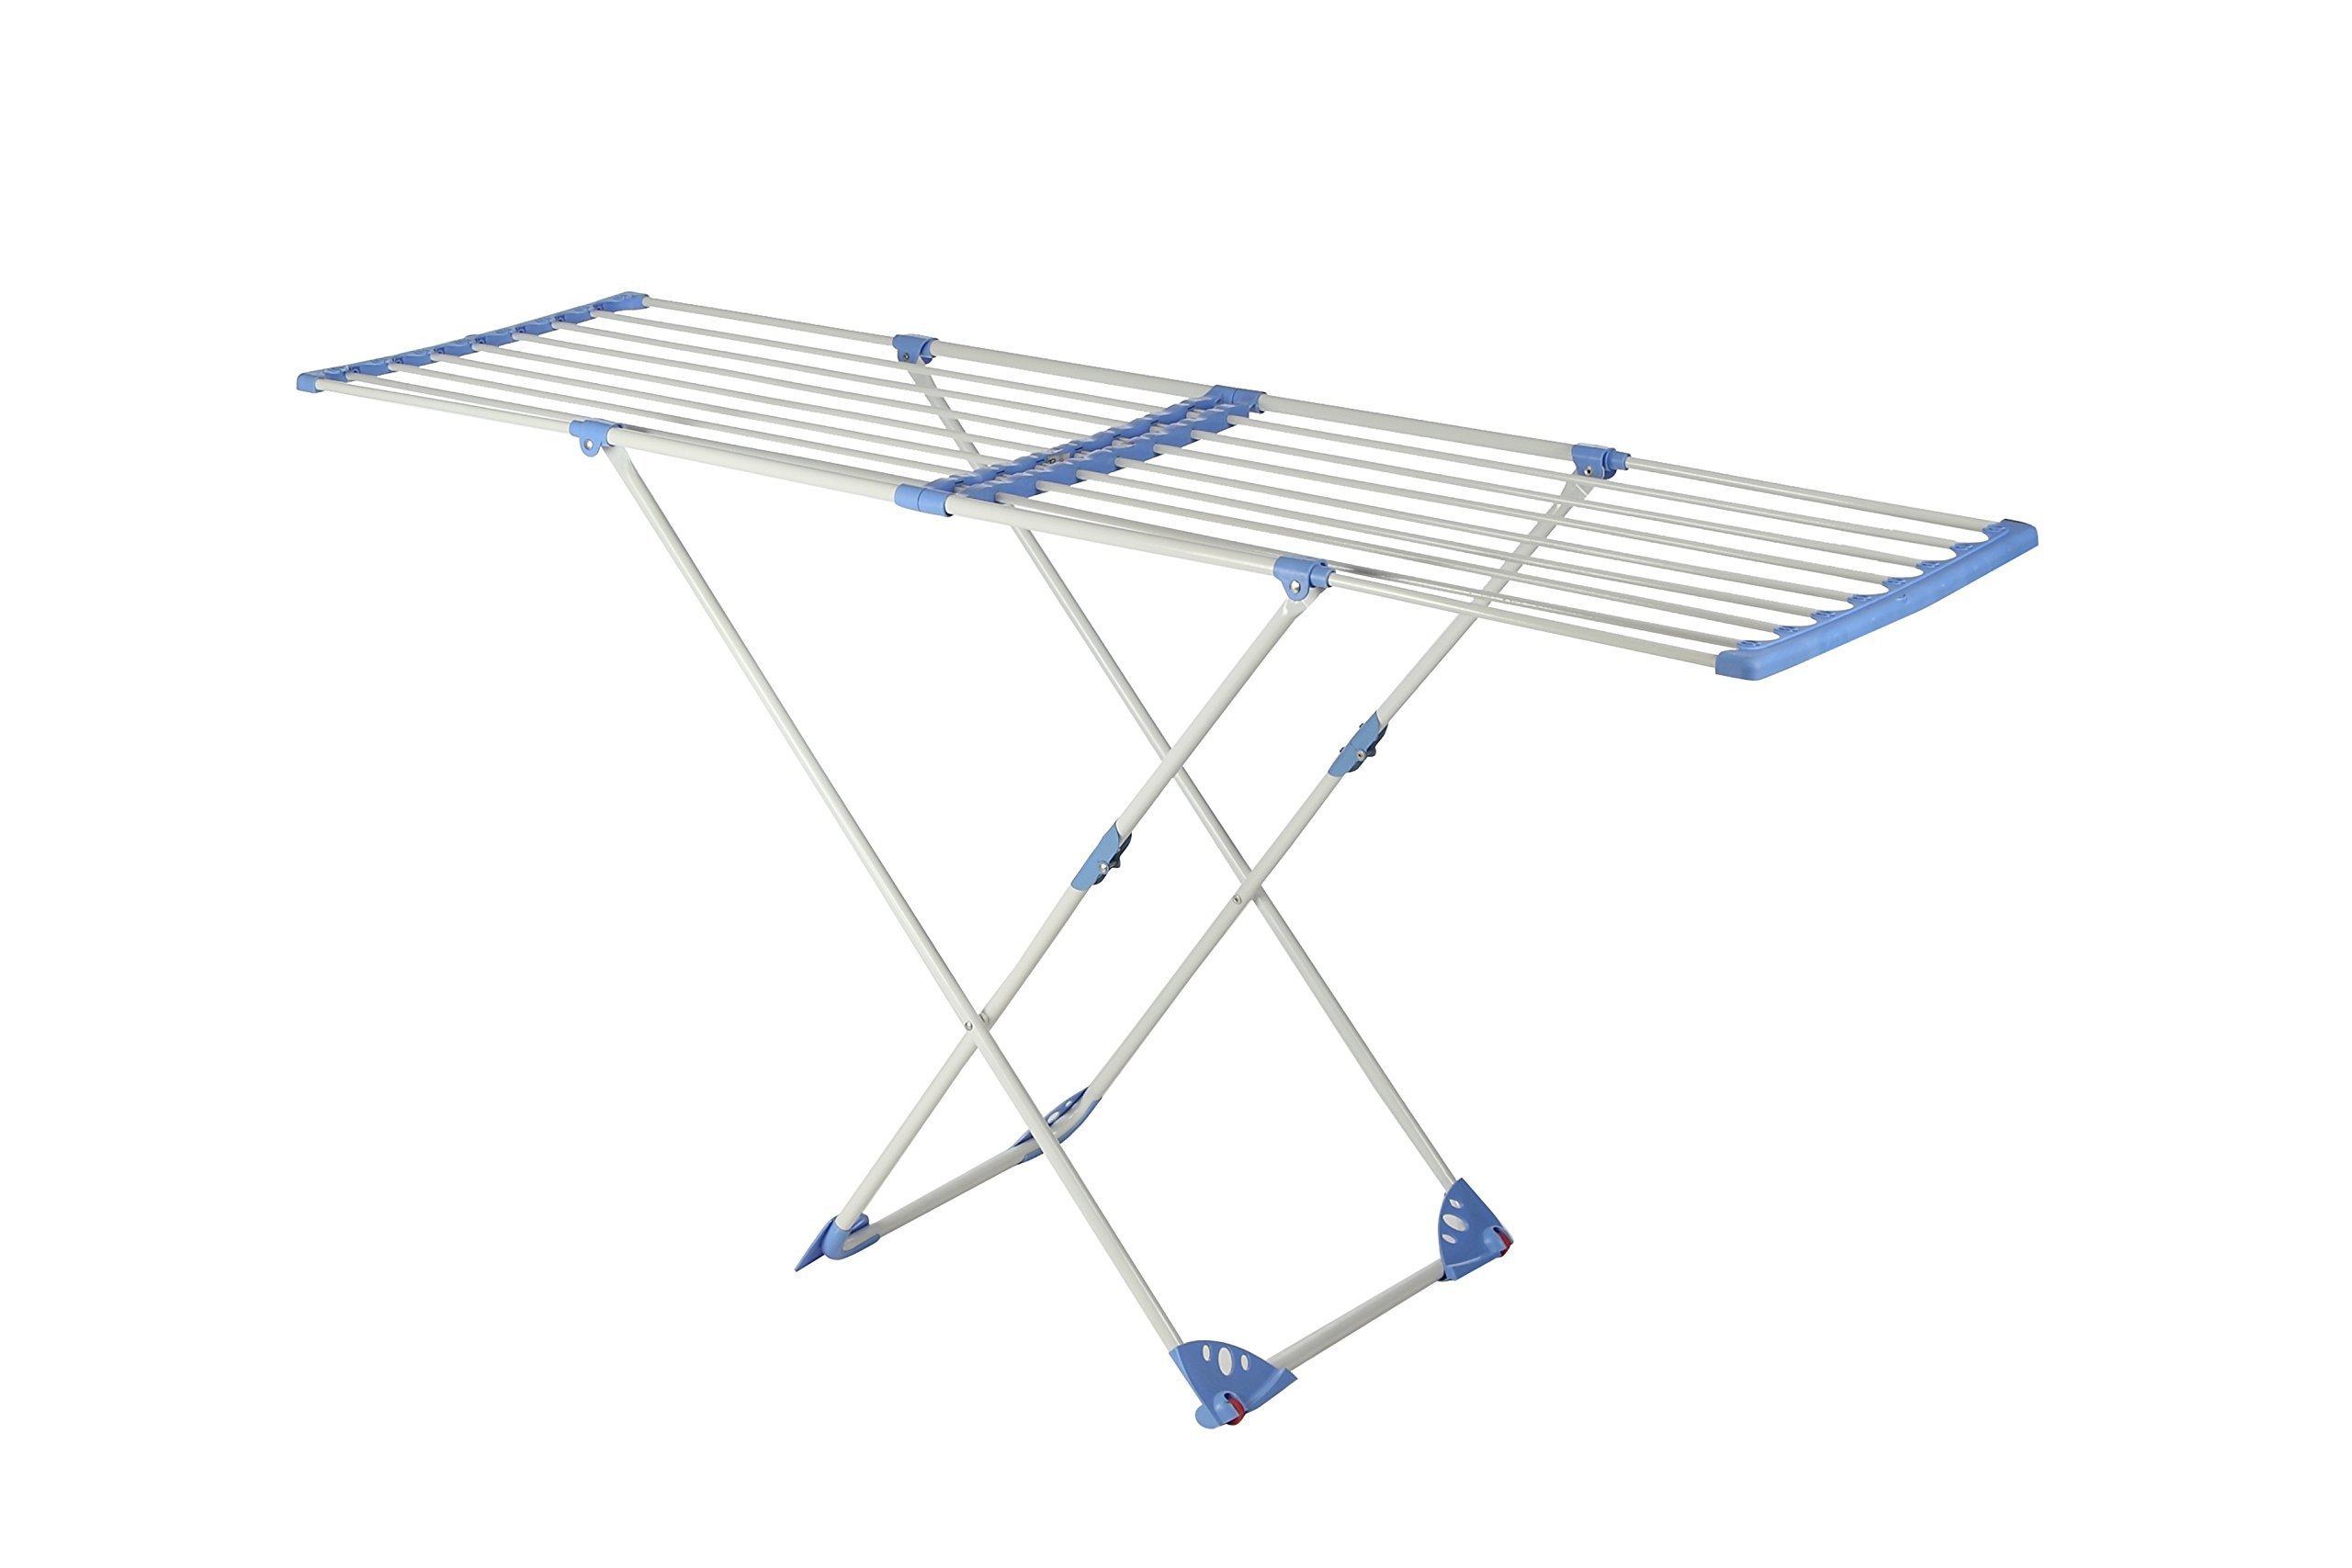 Bonita Flexy Clothes Drying Stand